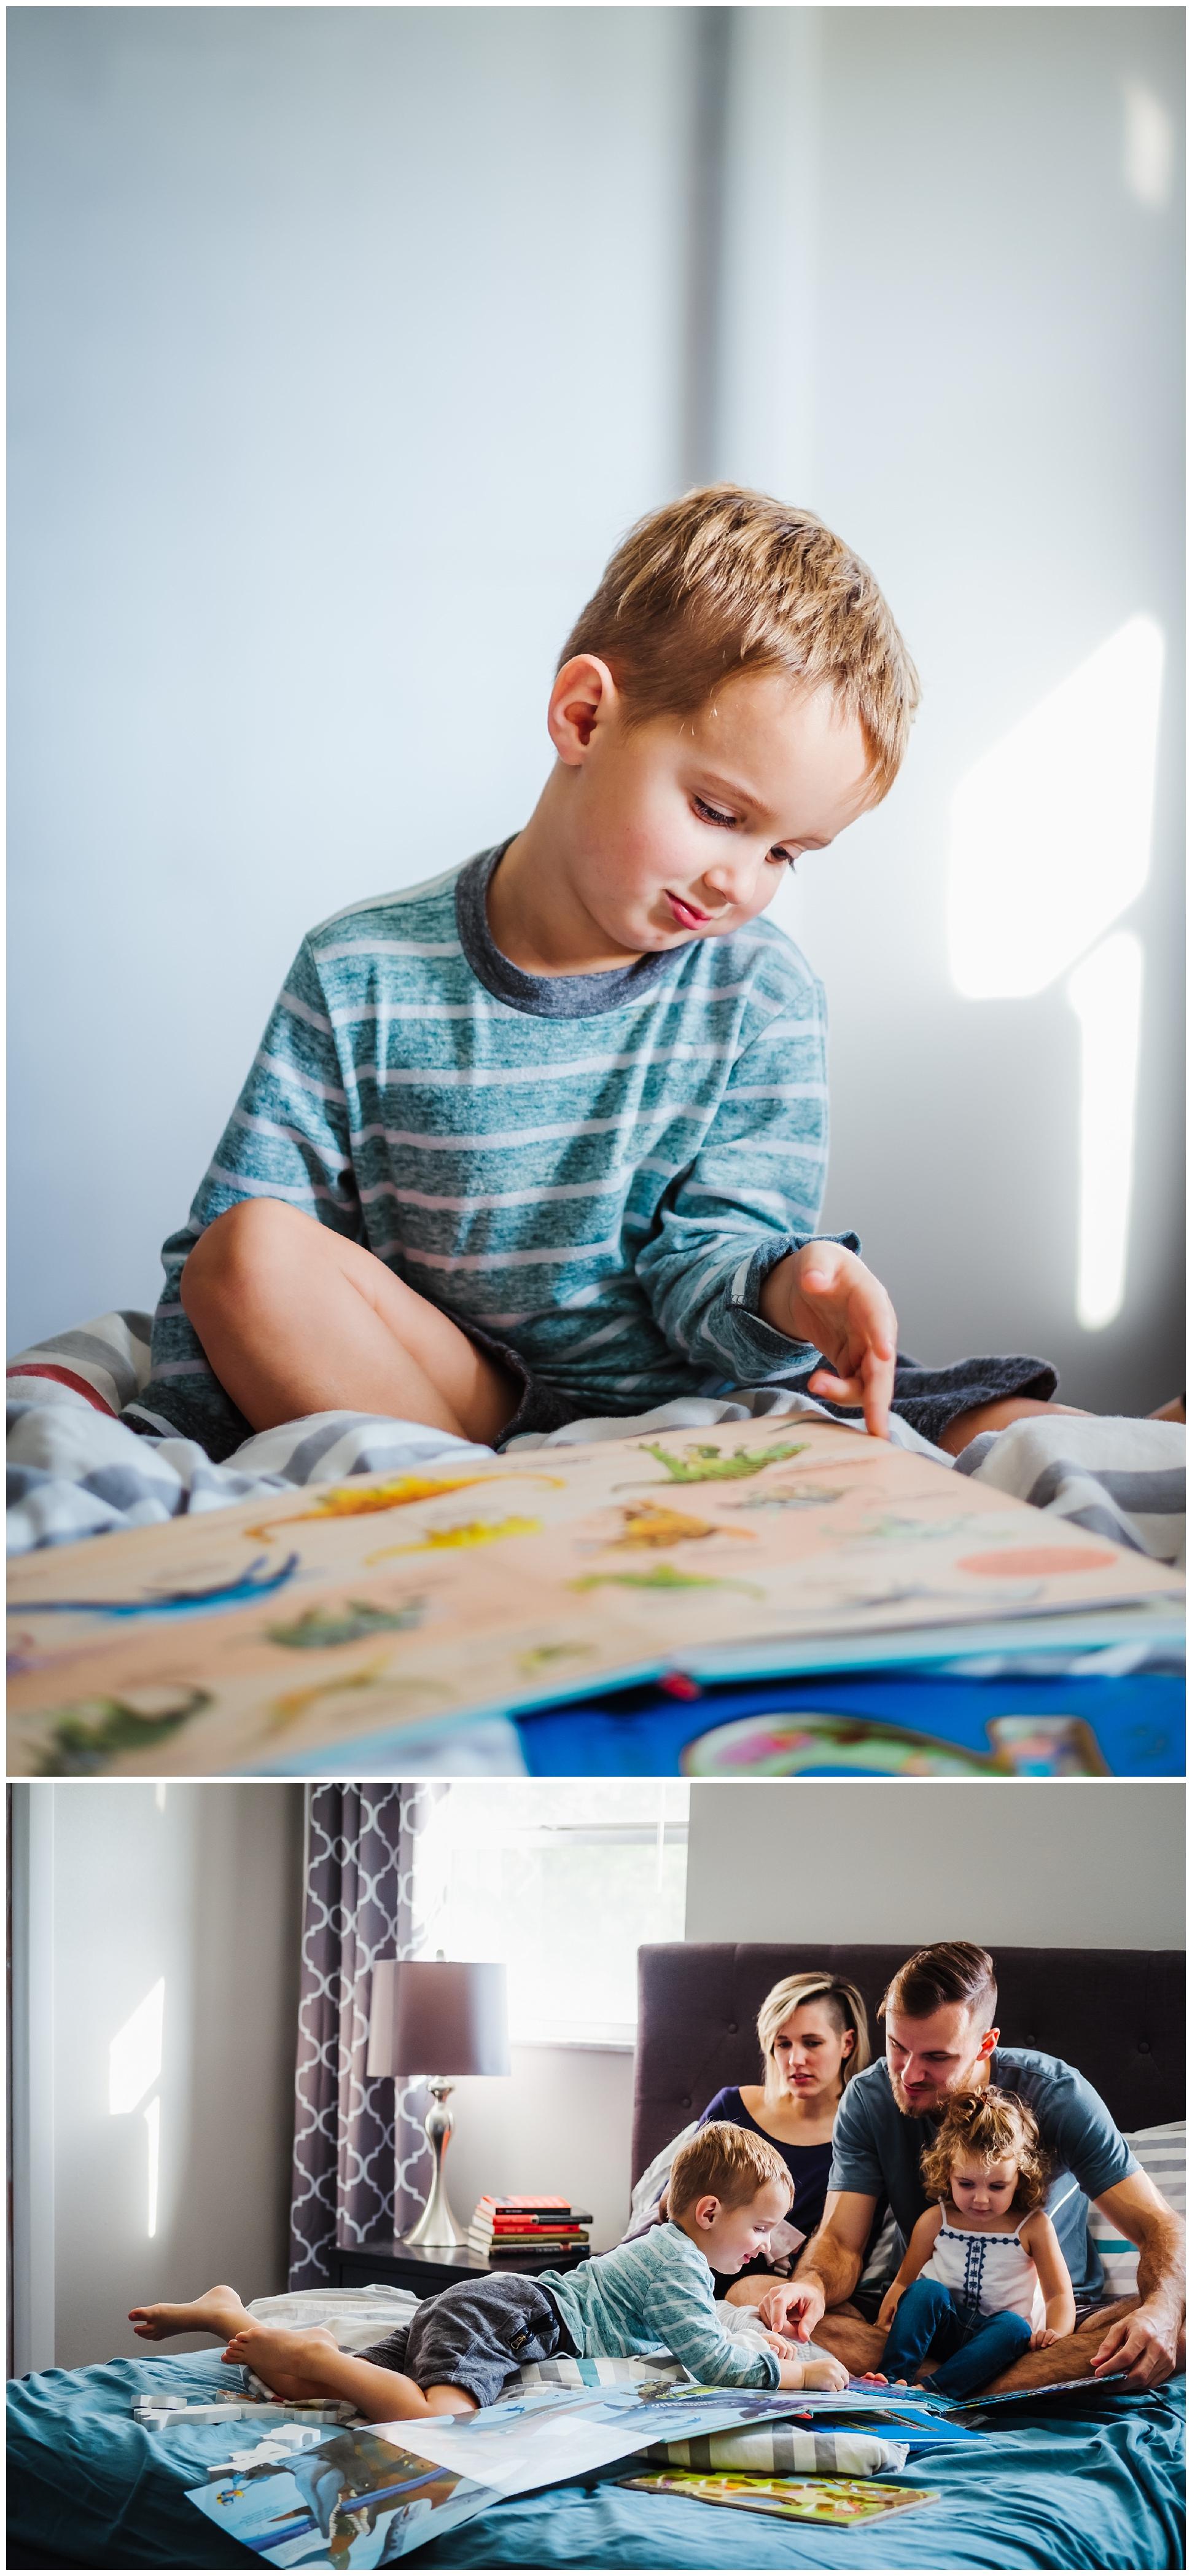 tampa-lifestyle-portrait-photographer-in-home-pentax-film-vs-digital_0019.jpg